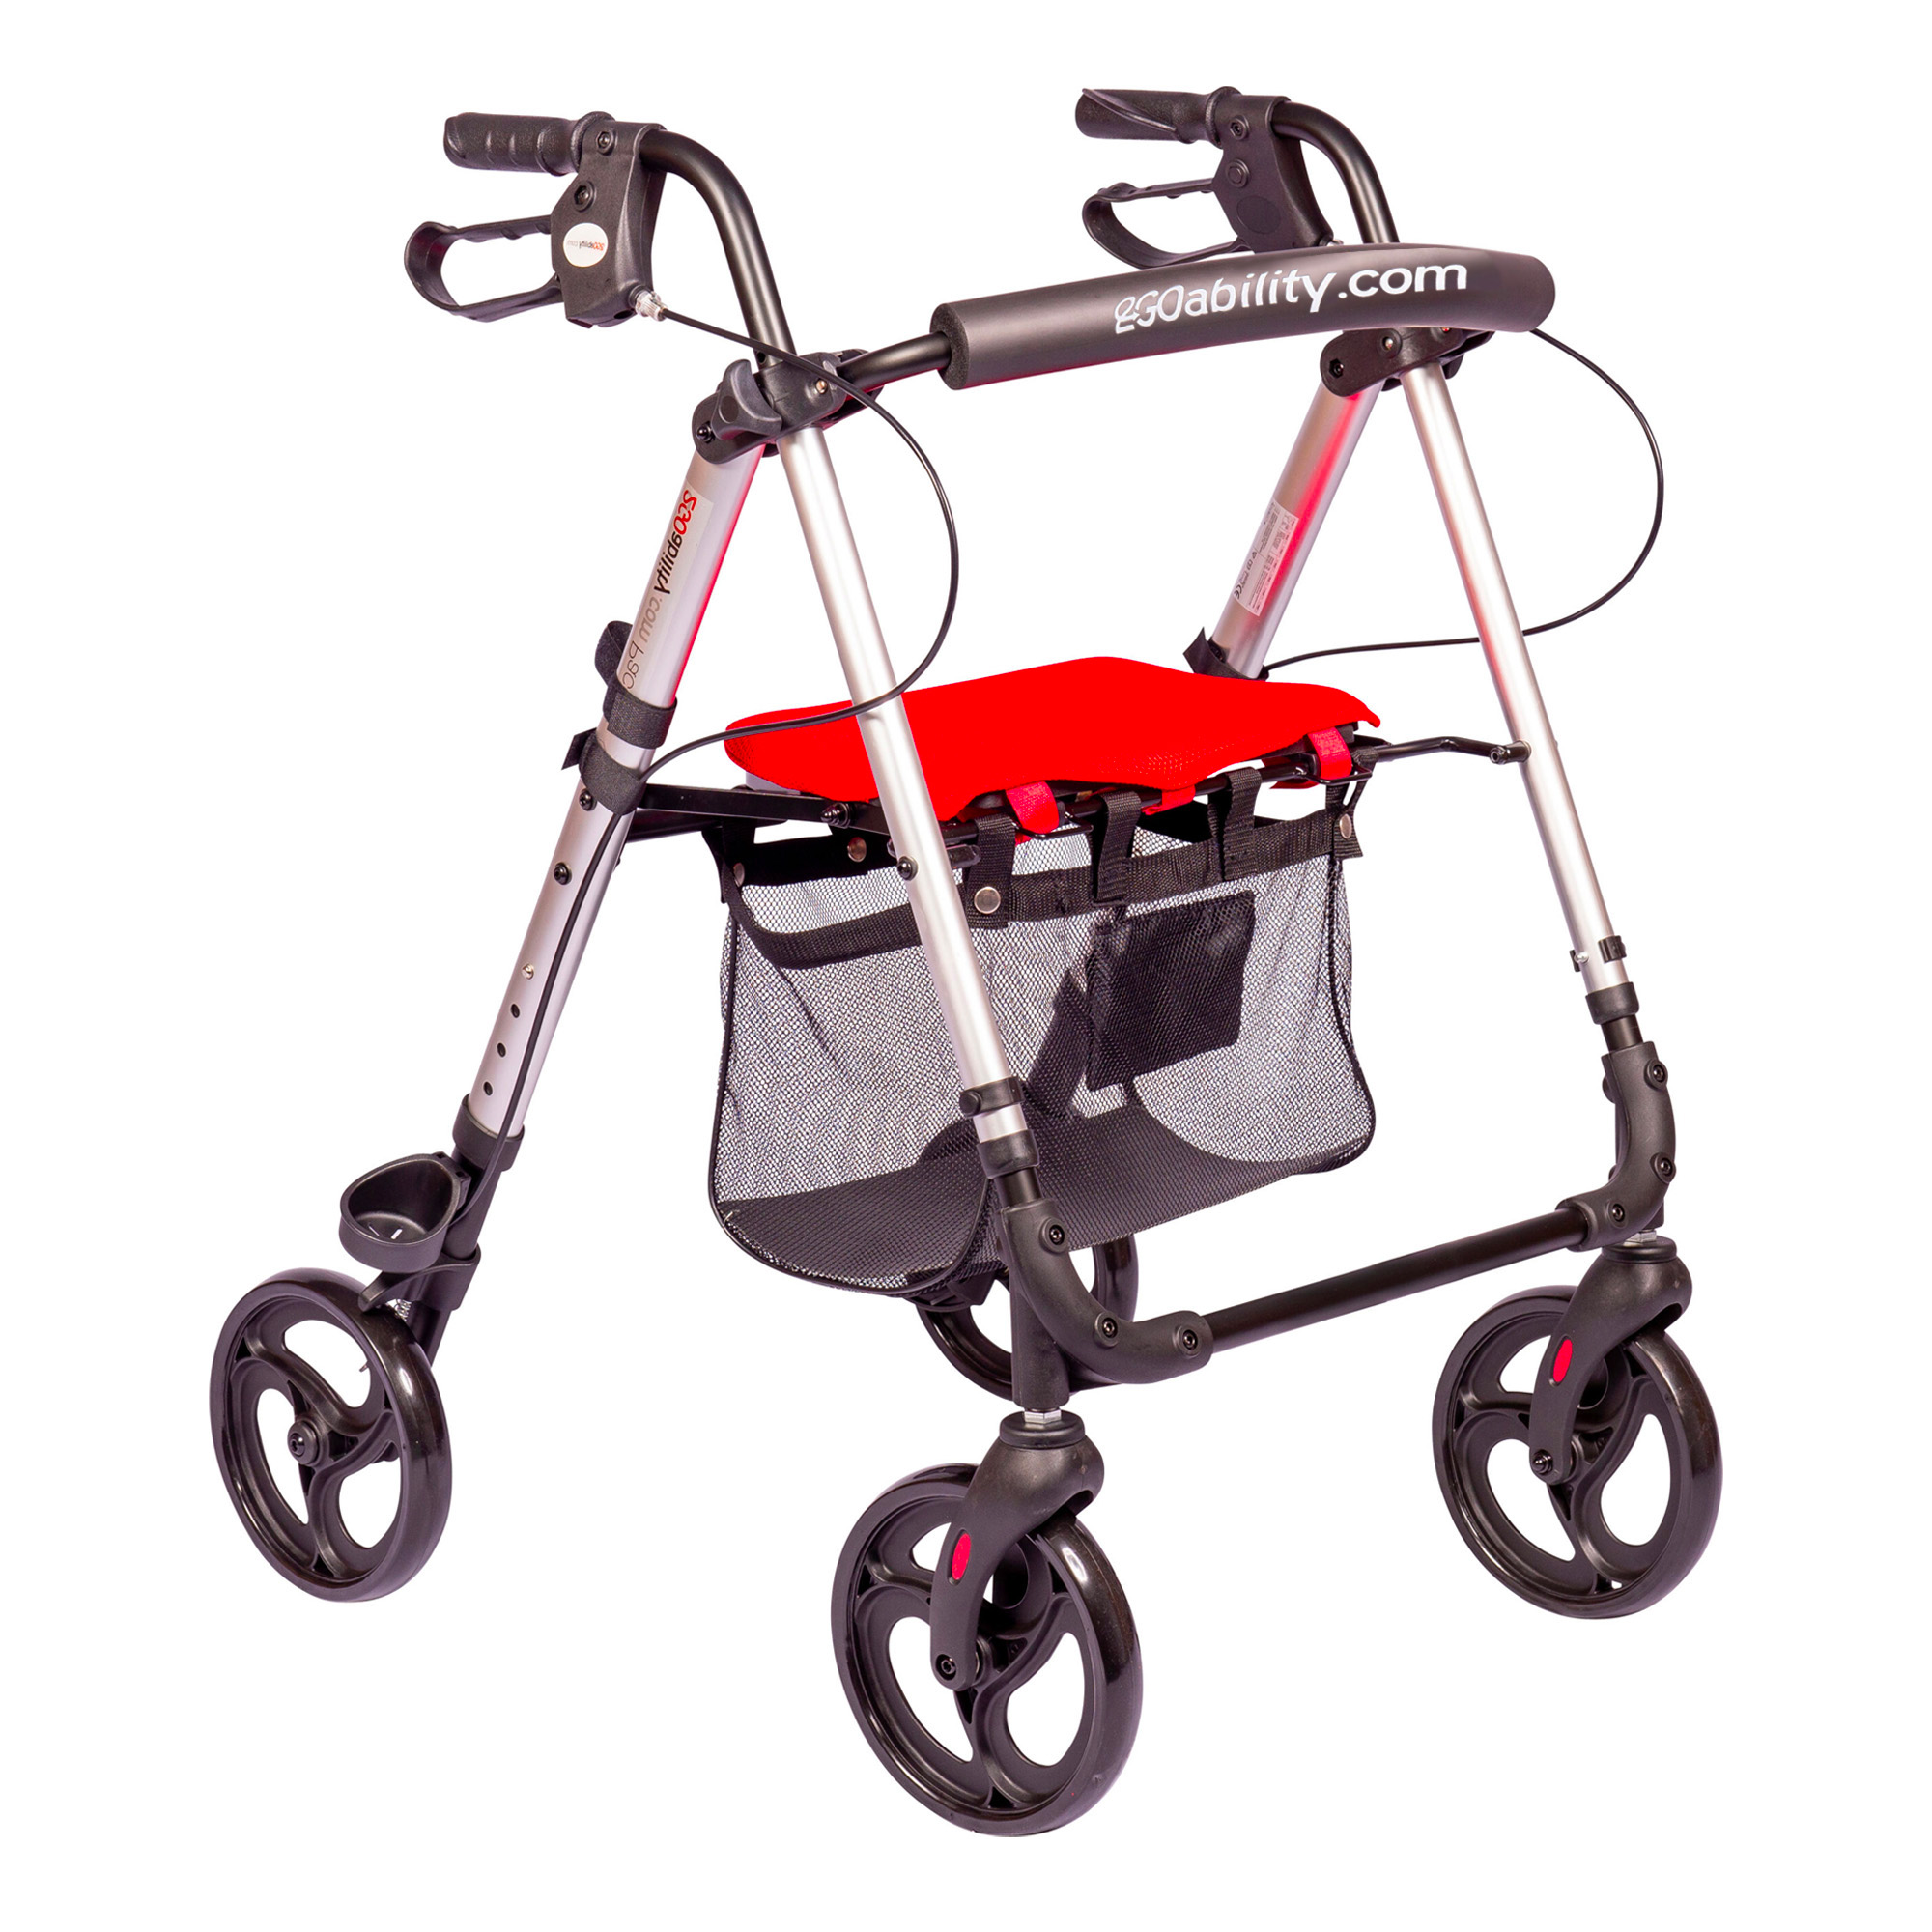 MobiQuip mobility walker